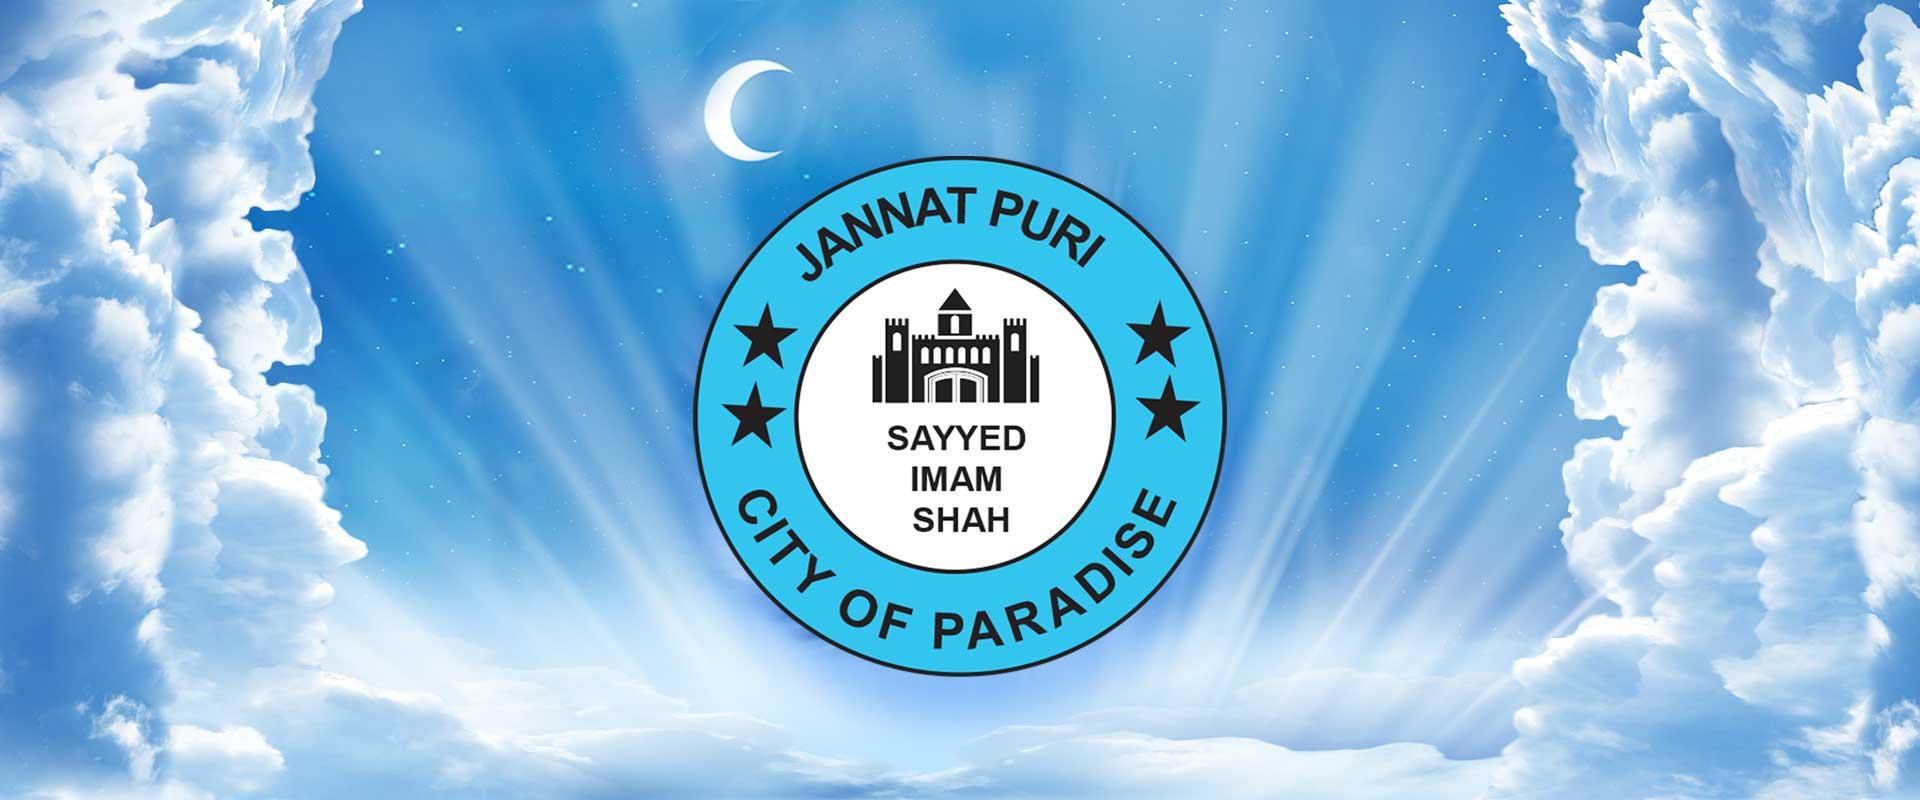 Jannat-Puri-bannner.jpg